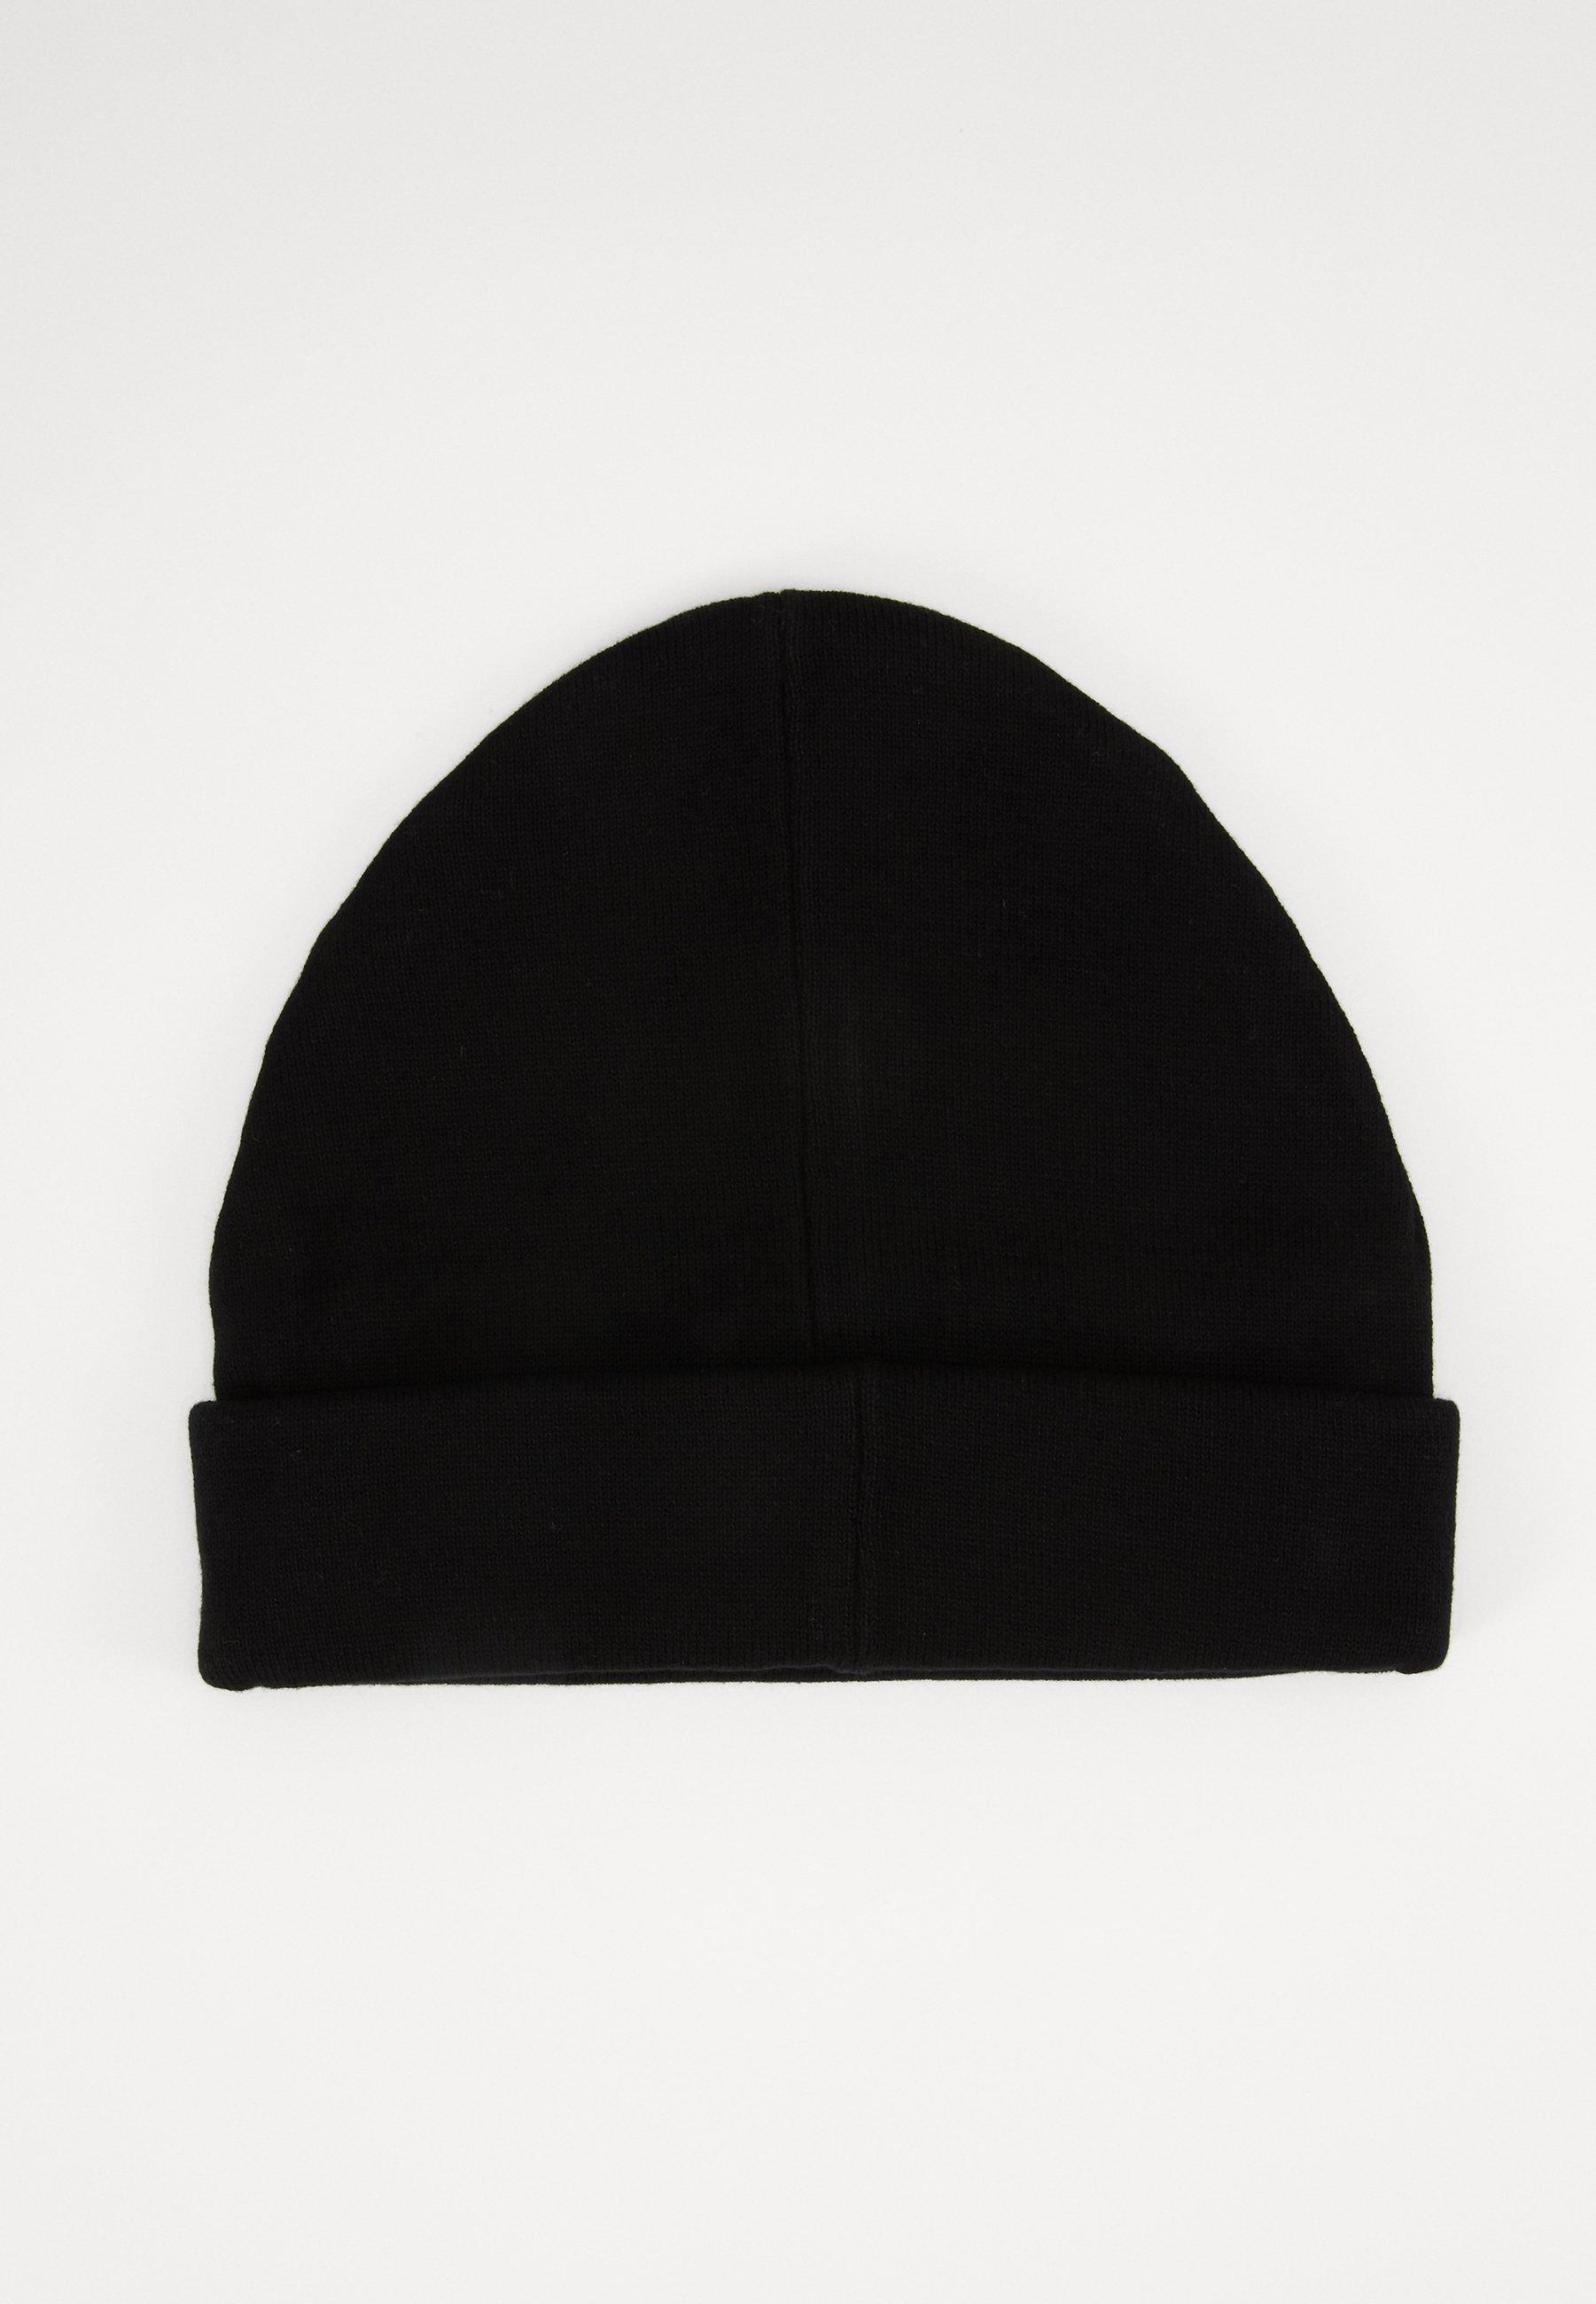 Zign Mütze - Black/schwarz